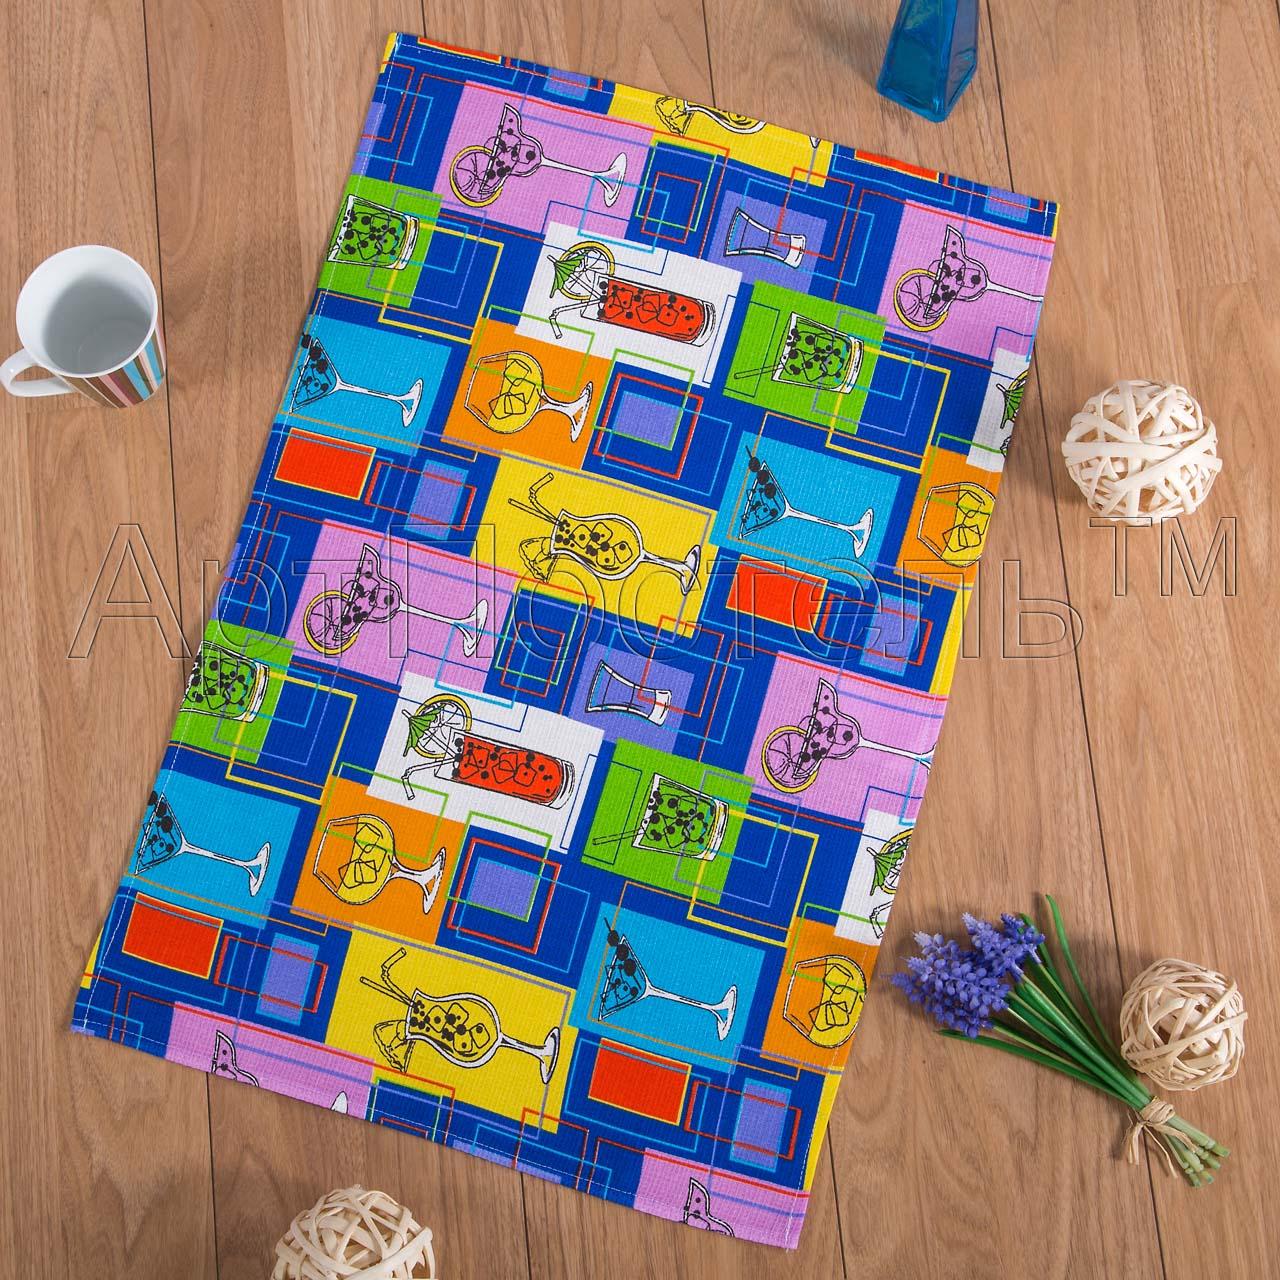 Вафельное полотенце Лимонад р. 50х70Вафельные полотенца<br>Плотность: 160 г/кв. м<br><br>Тип: Вафельное полотенце<br>Размер: 50х70<br>Материал: Вафельное полотно